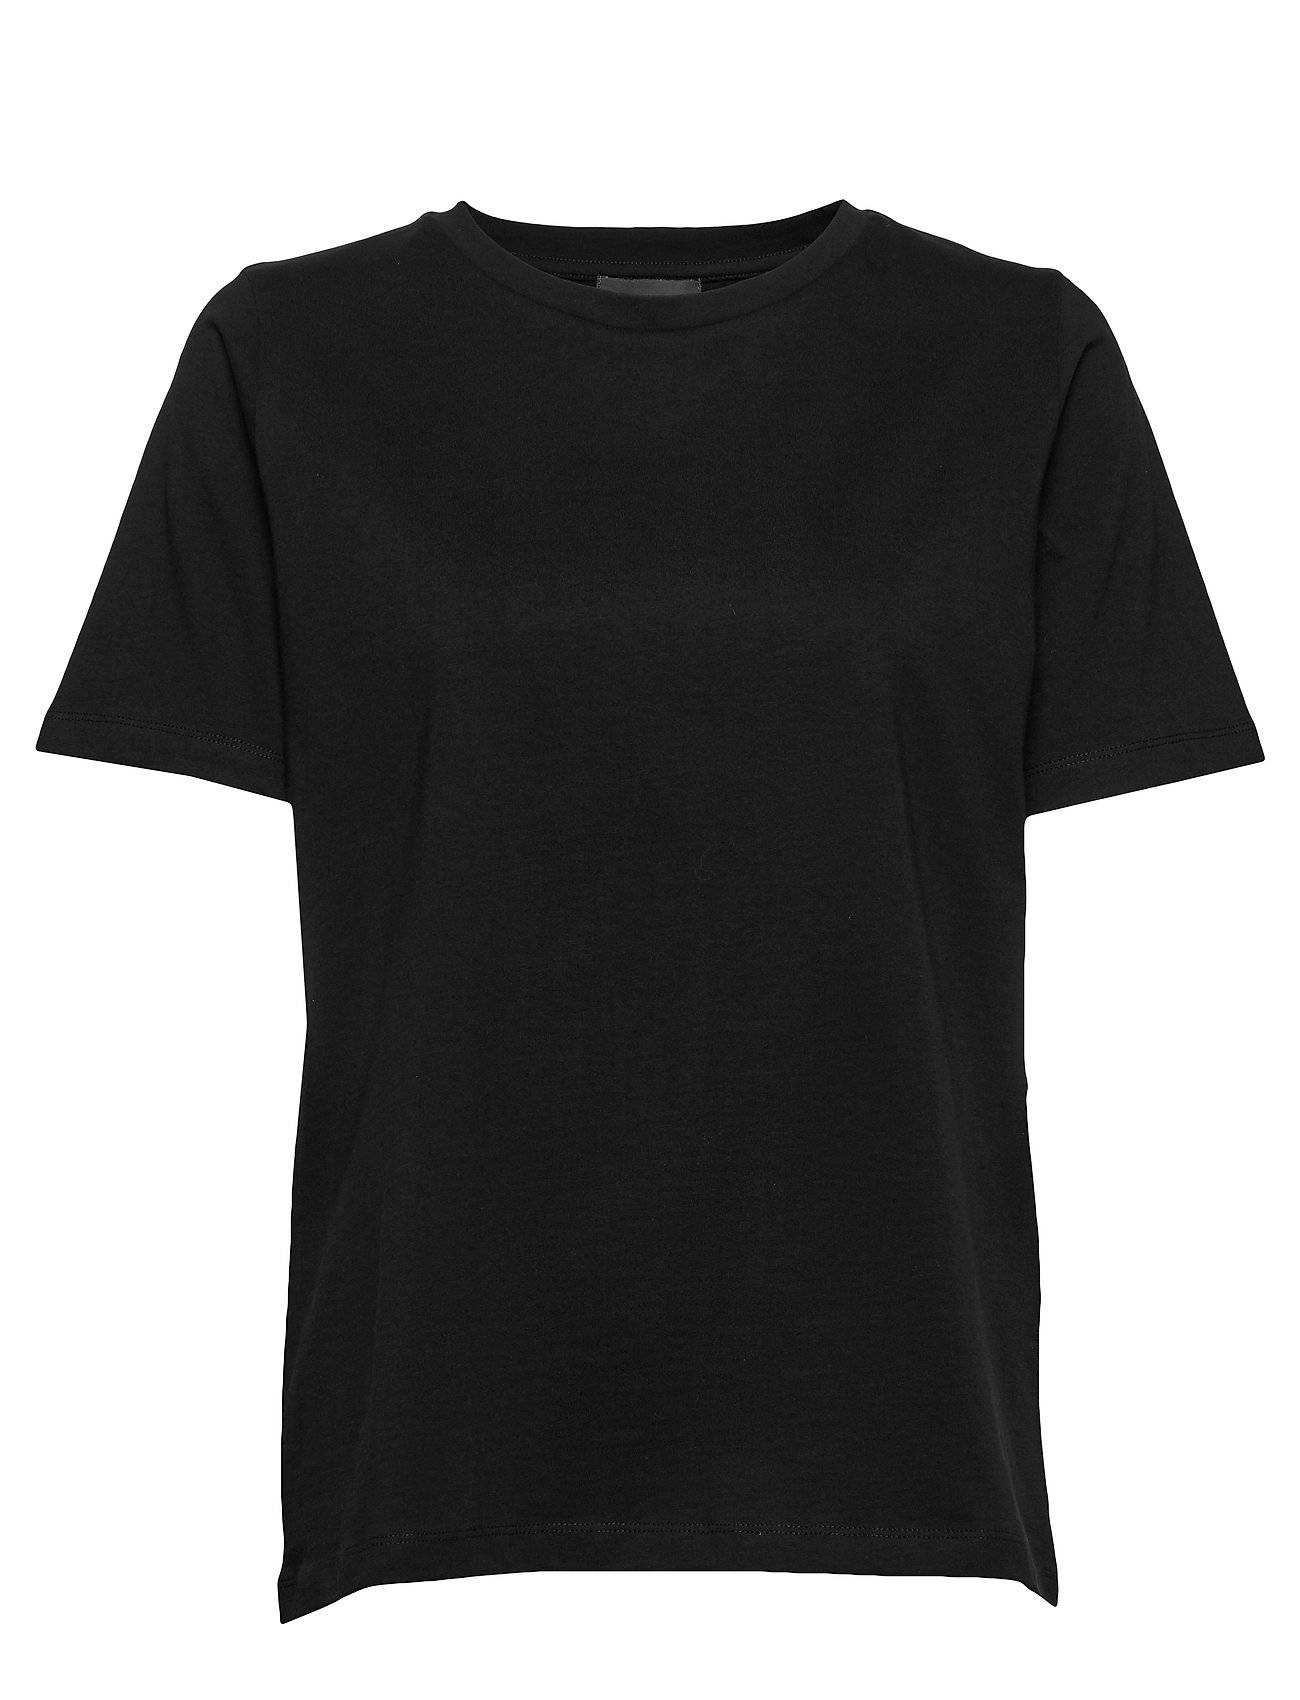 Residus Obi Organic Cotton Tee T-shirts & Tops Short-sleeved Musta Residus